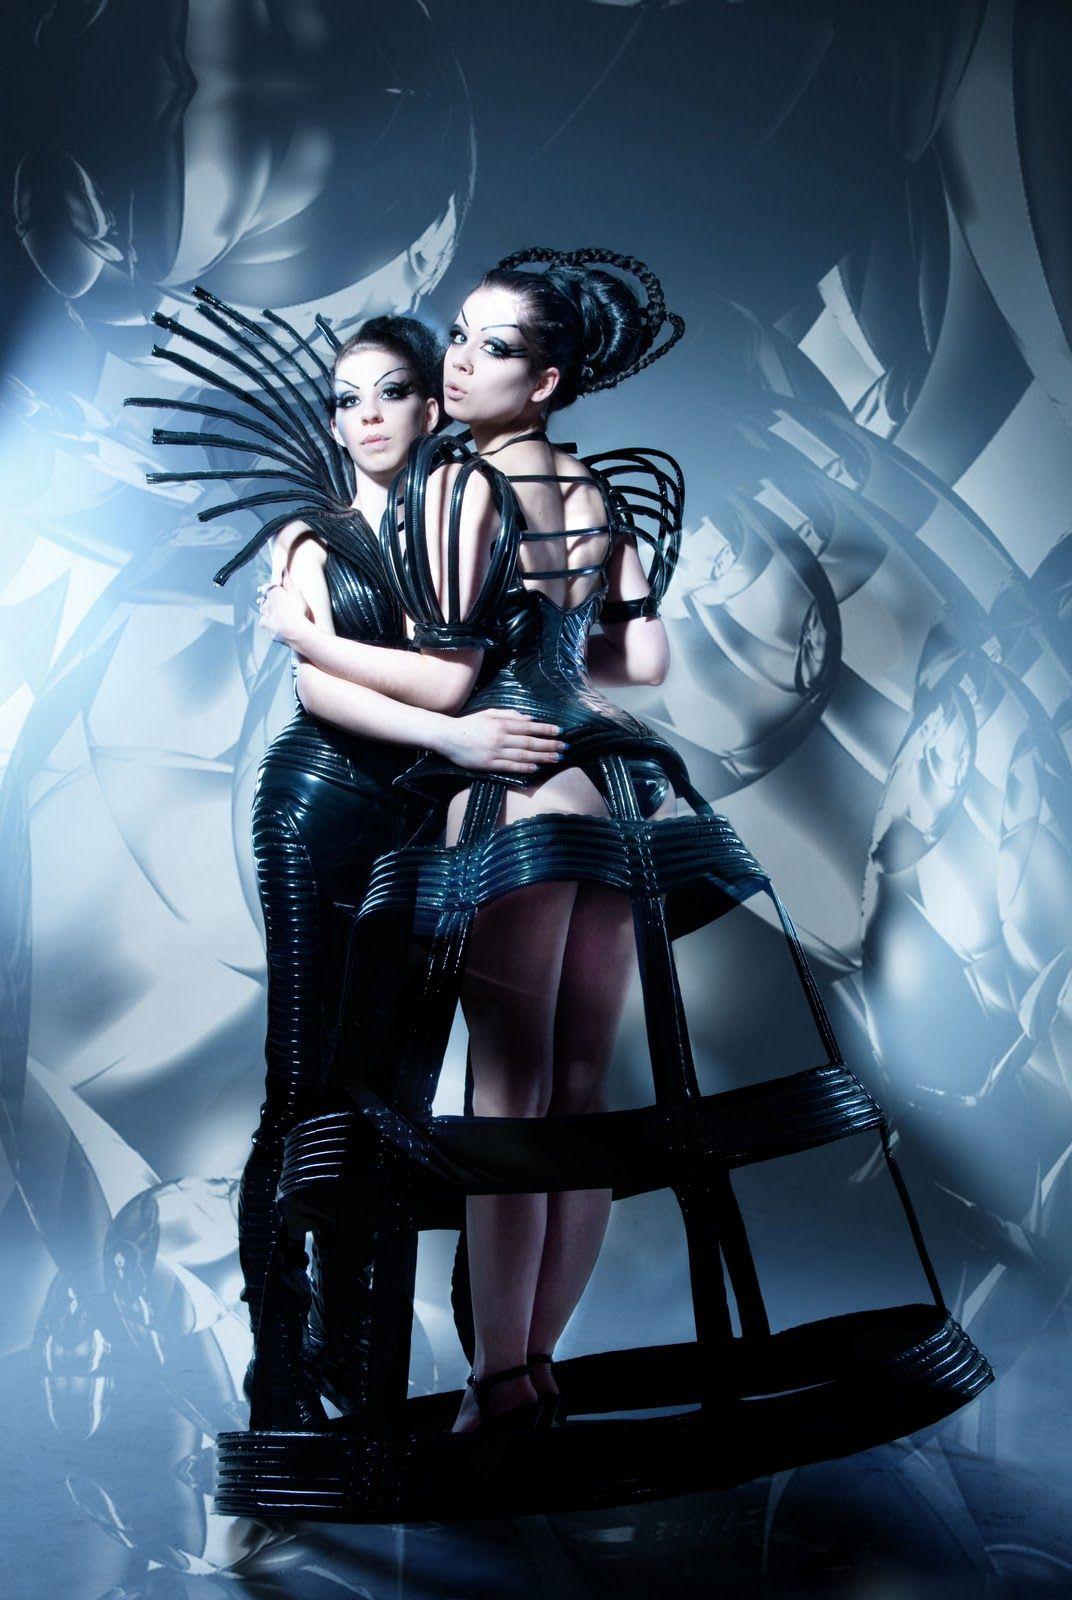 Tatjana warnecke- cosmic Couture | Inspirational Fashion and ...